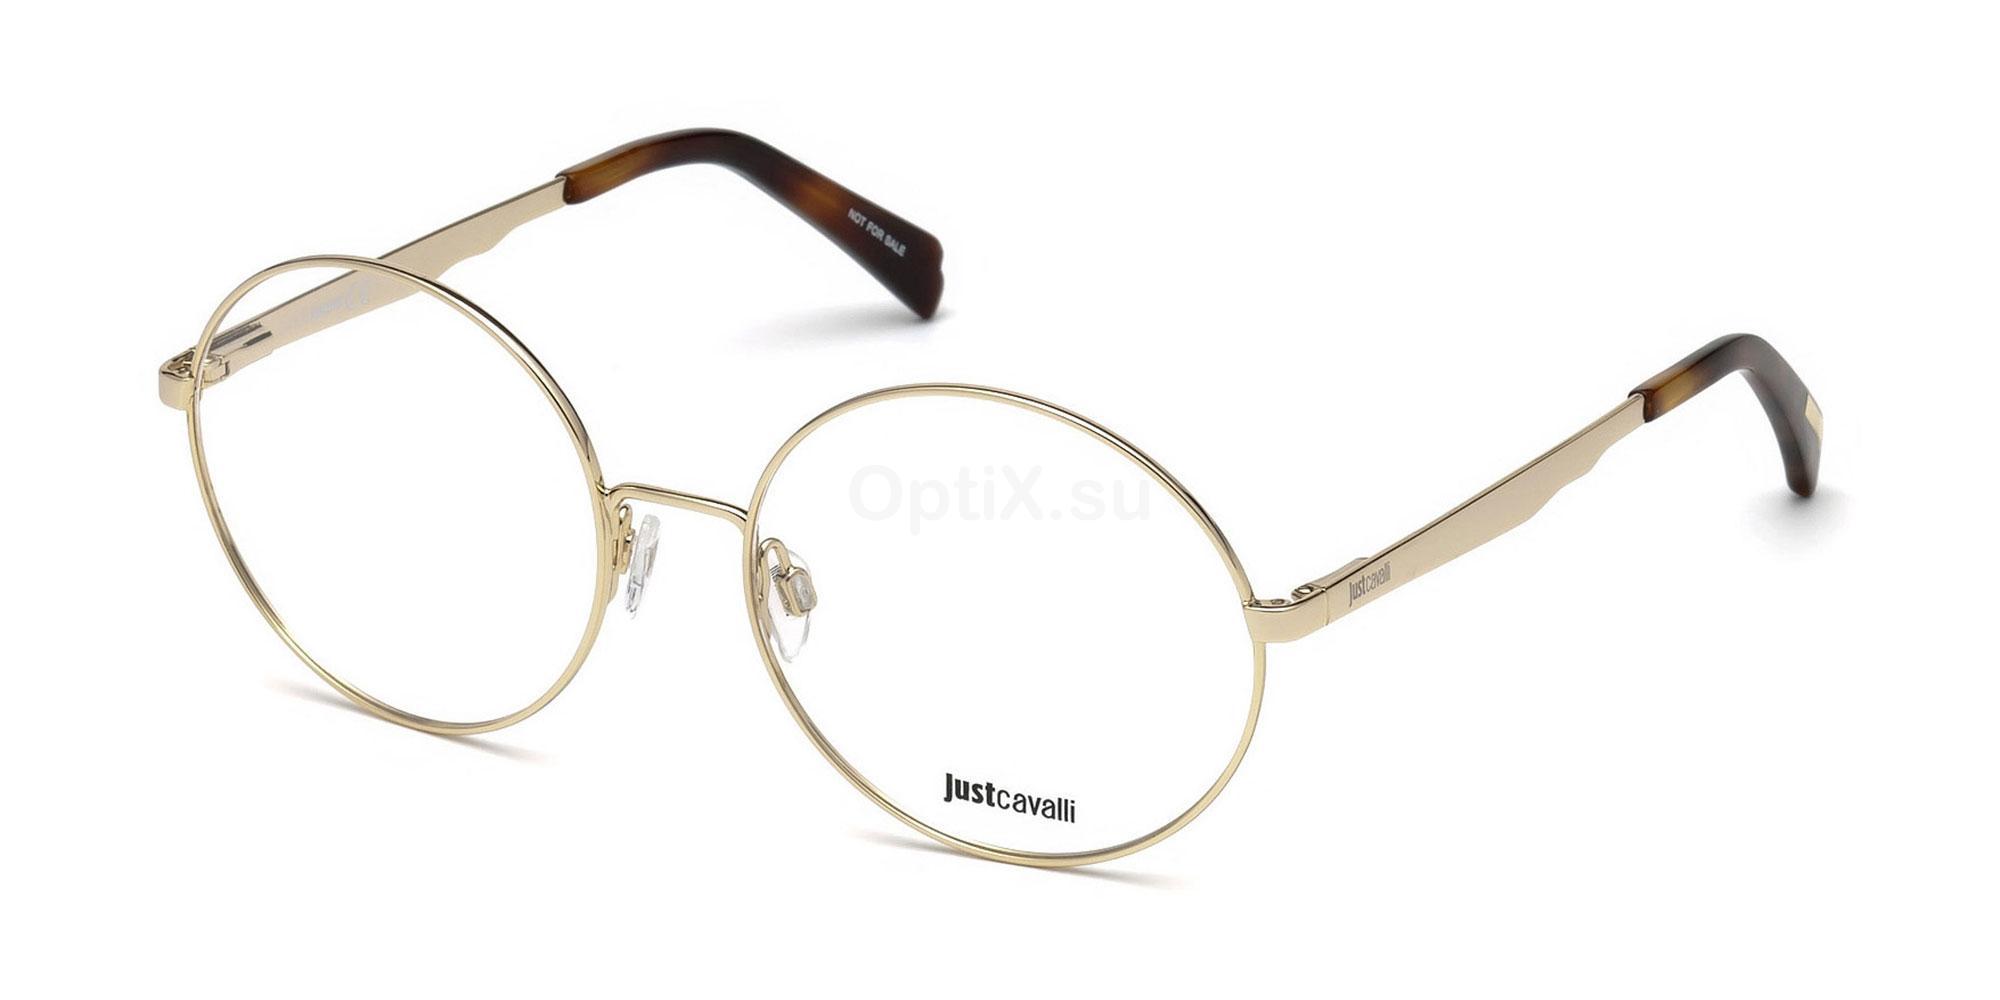 032 JC0849 Glasses, Just Cavalli